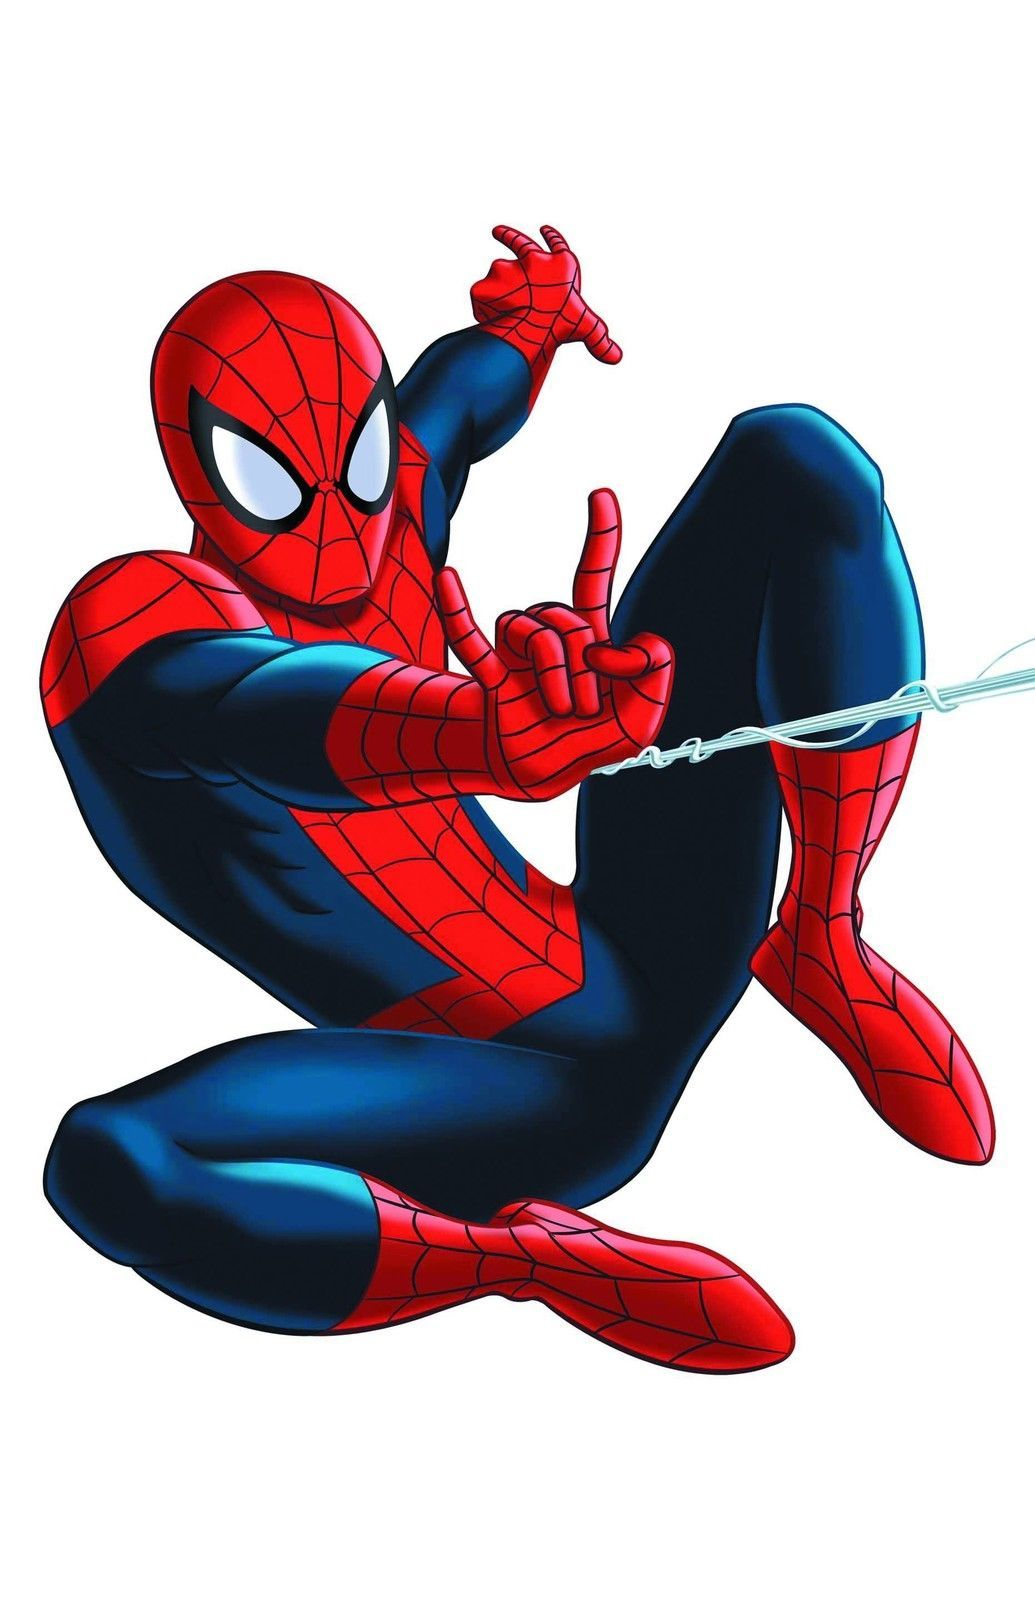 2 5 Spiderman T Shirt Iron On Transfer 8x10 5x6 3x3 Light Fabric Ebay Home Garden Spiderman Cartoon Ultimate Spiderman Spiderman